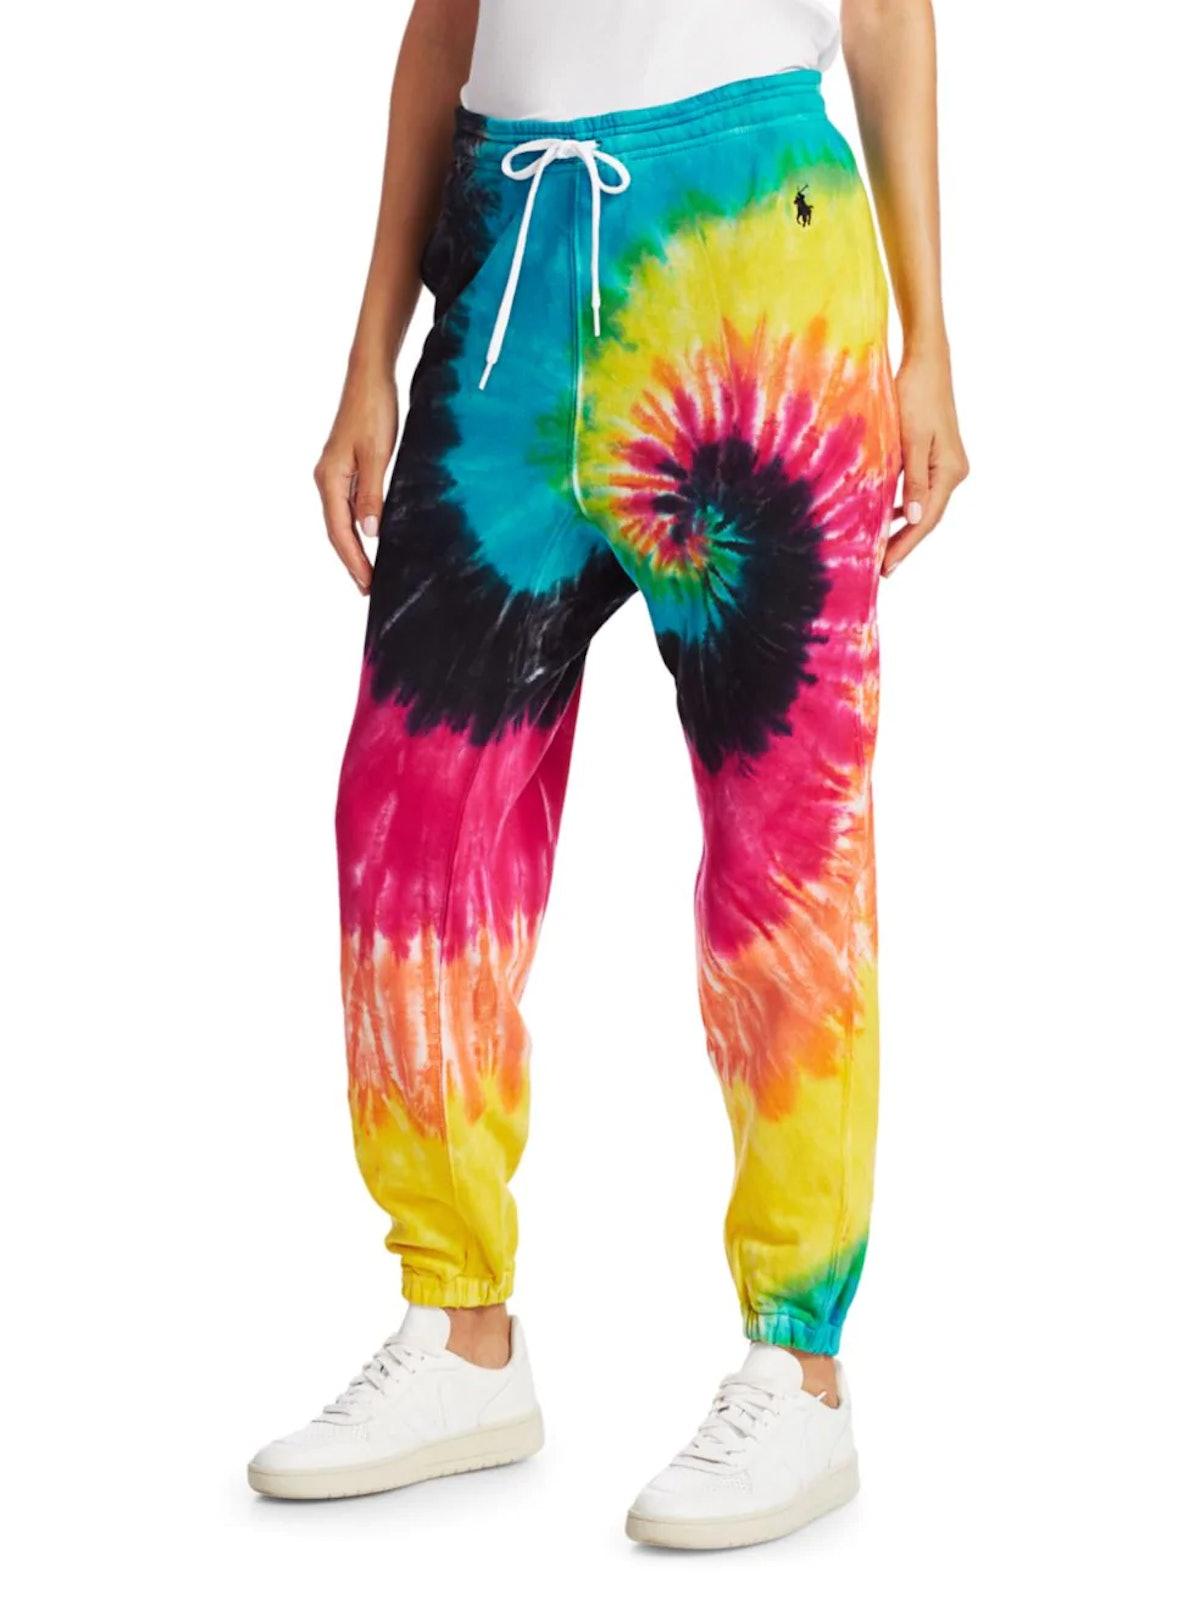 Polo Ralph Lauren Tie Dye Jogger Sweatpants